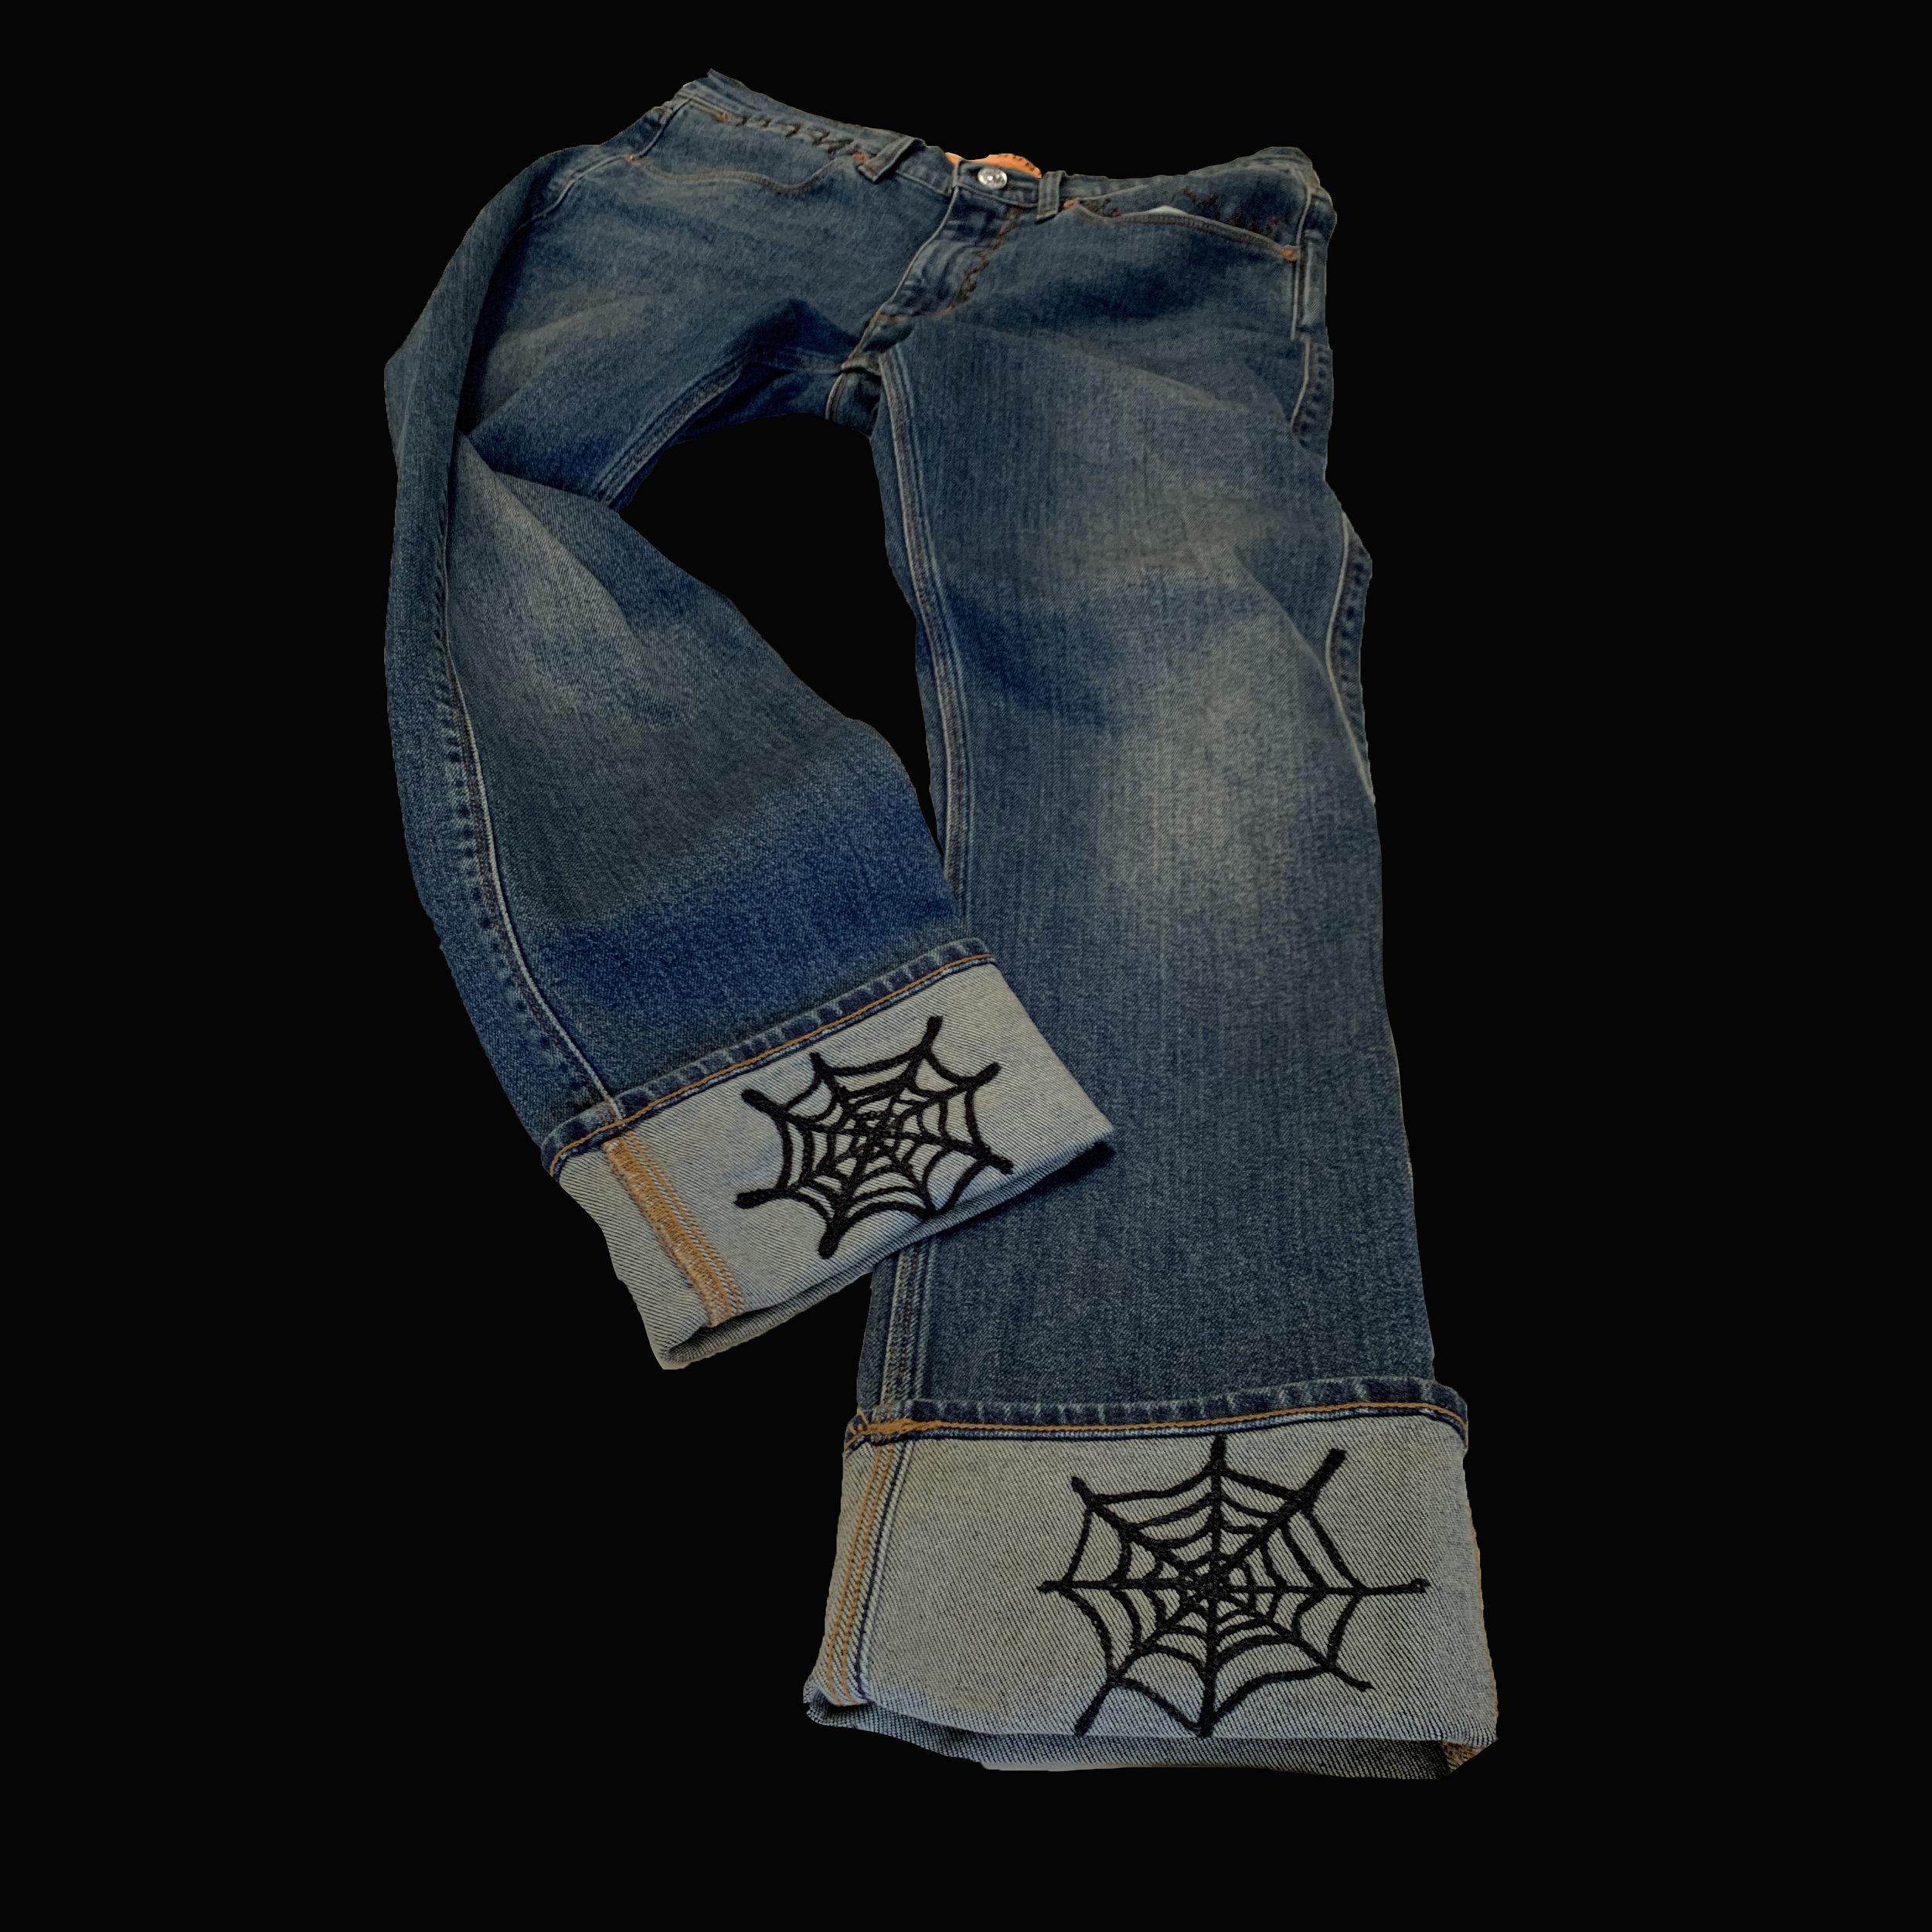 Acne Jeans Weds Full Black copy.jpg